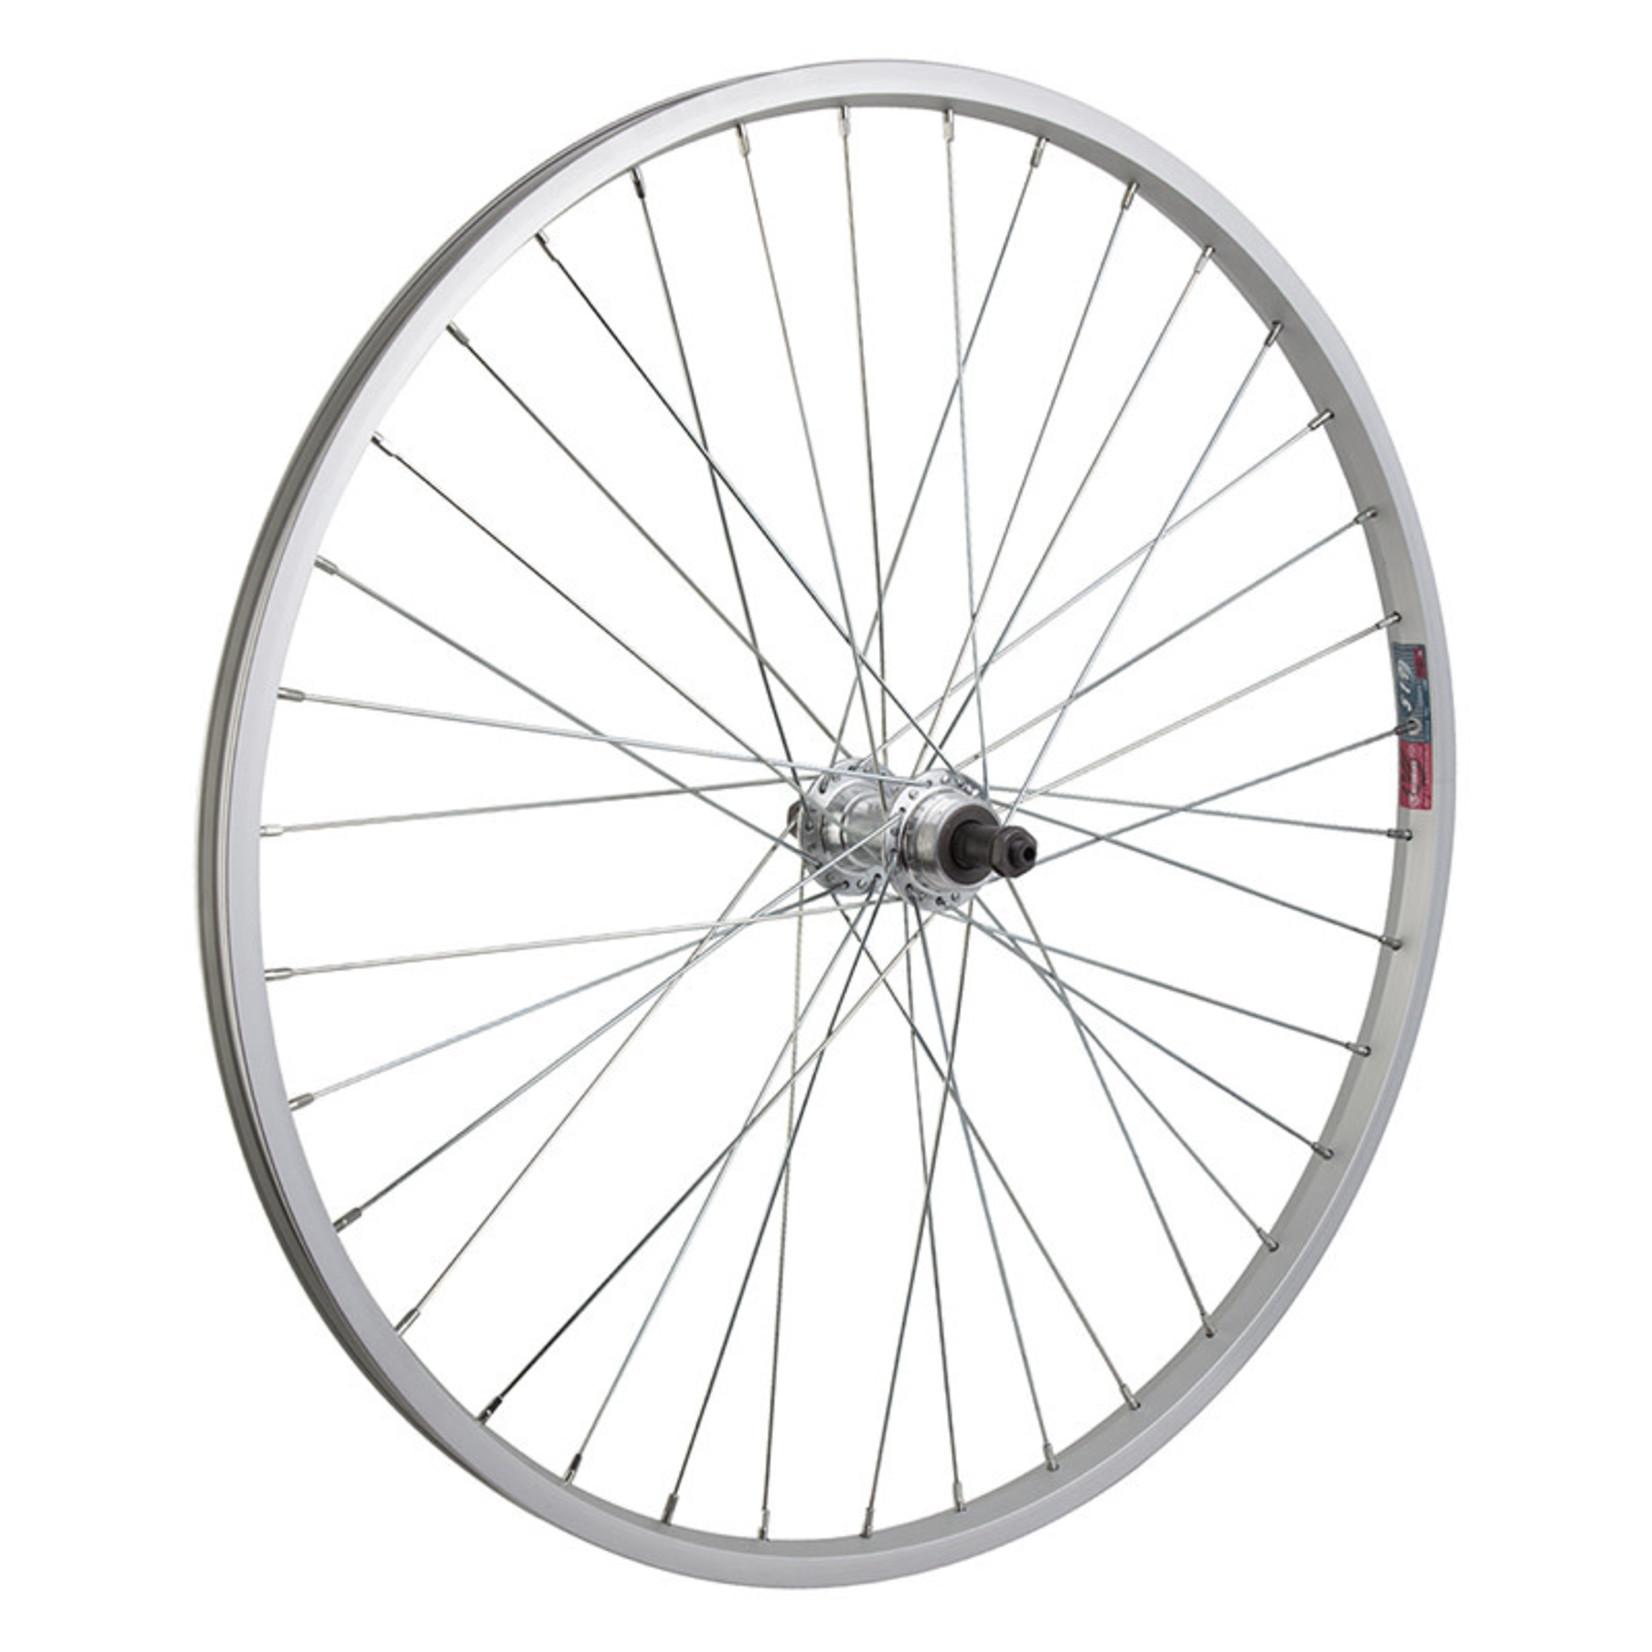 "26"" Rear Wheel Alloy Mountain Single Wall Silver FW QR"